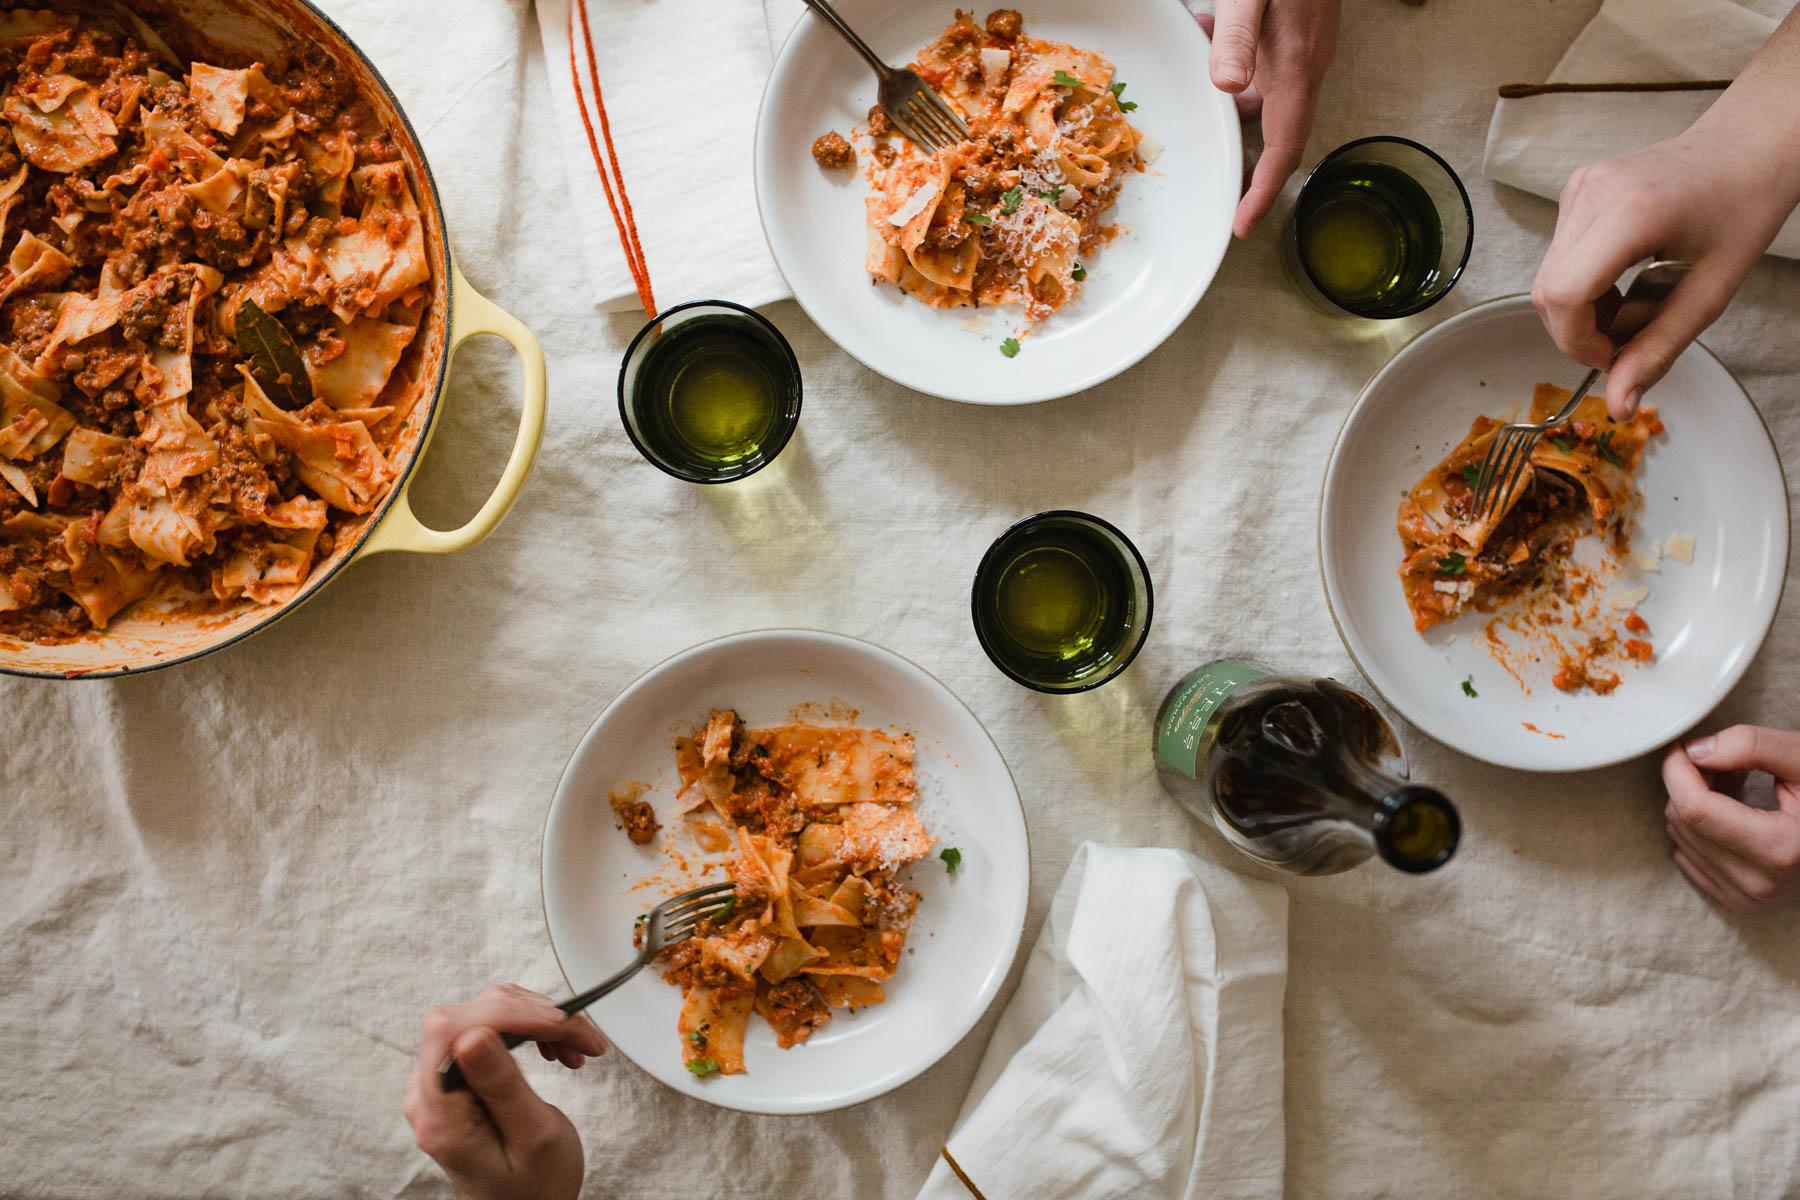 chicago-nyc-food-lifestyle-photographer-14.jpg